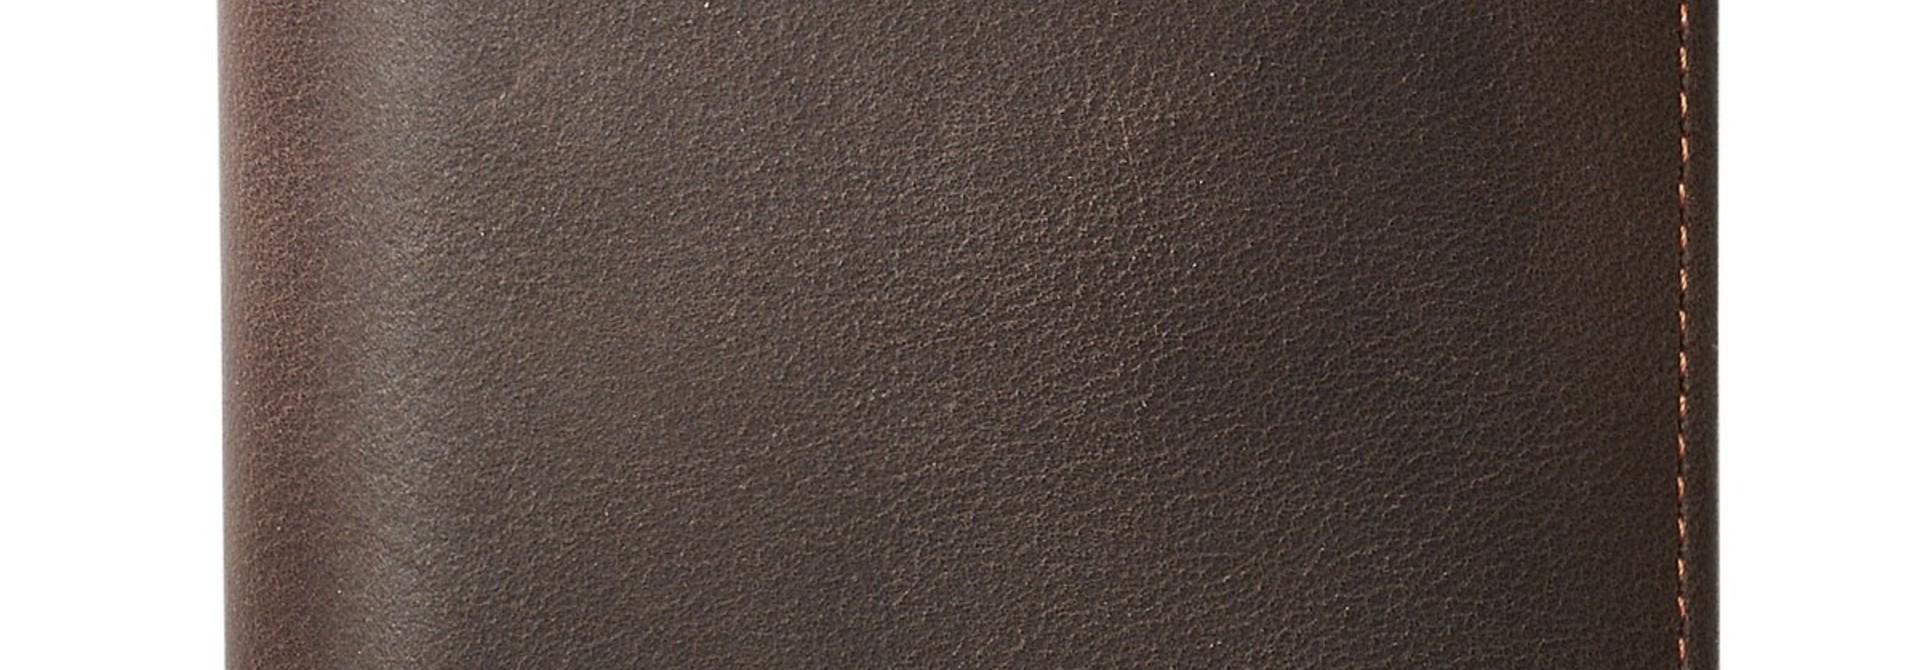 Härkila Wallet With Coin Room Dark Brown